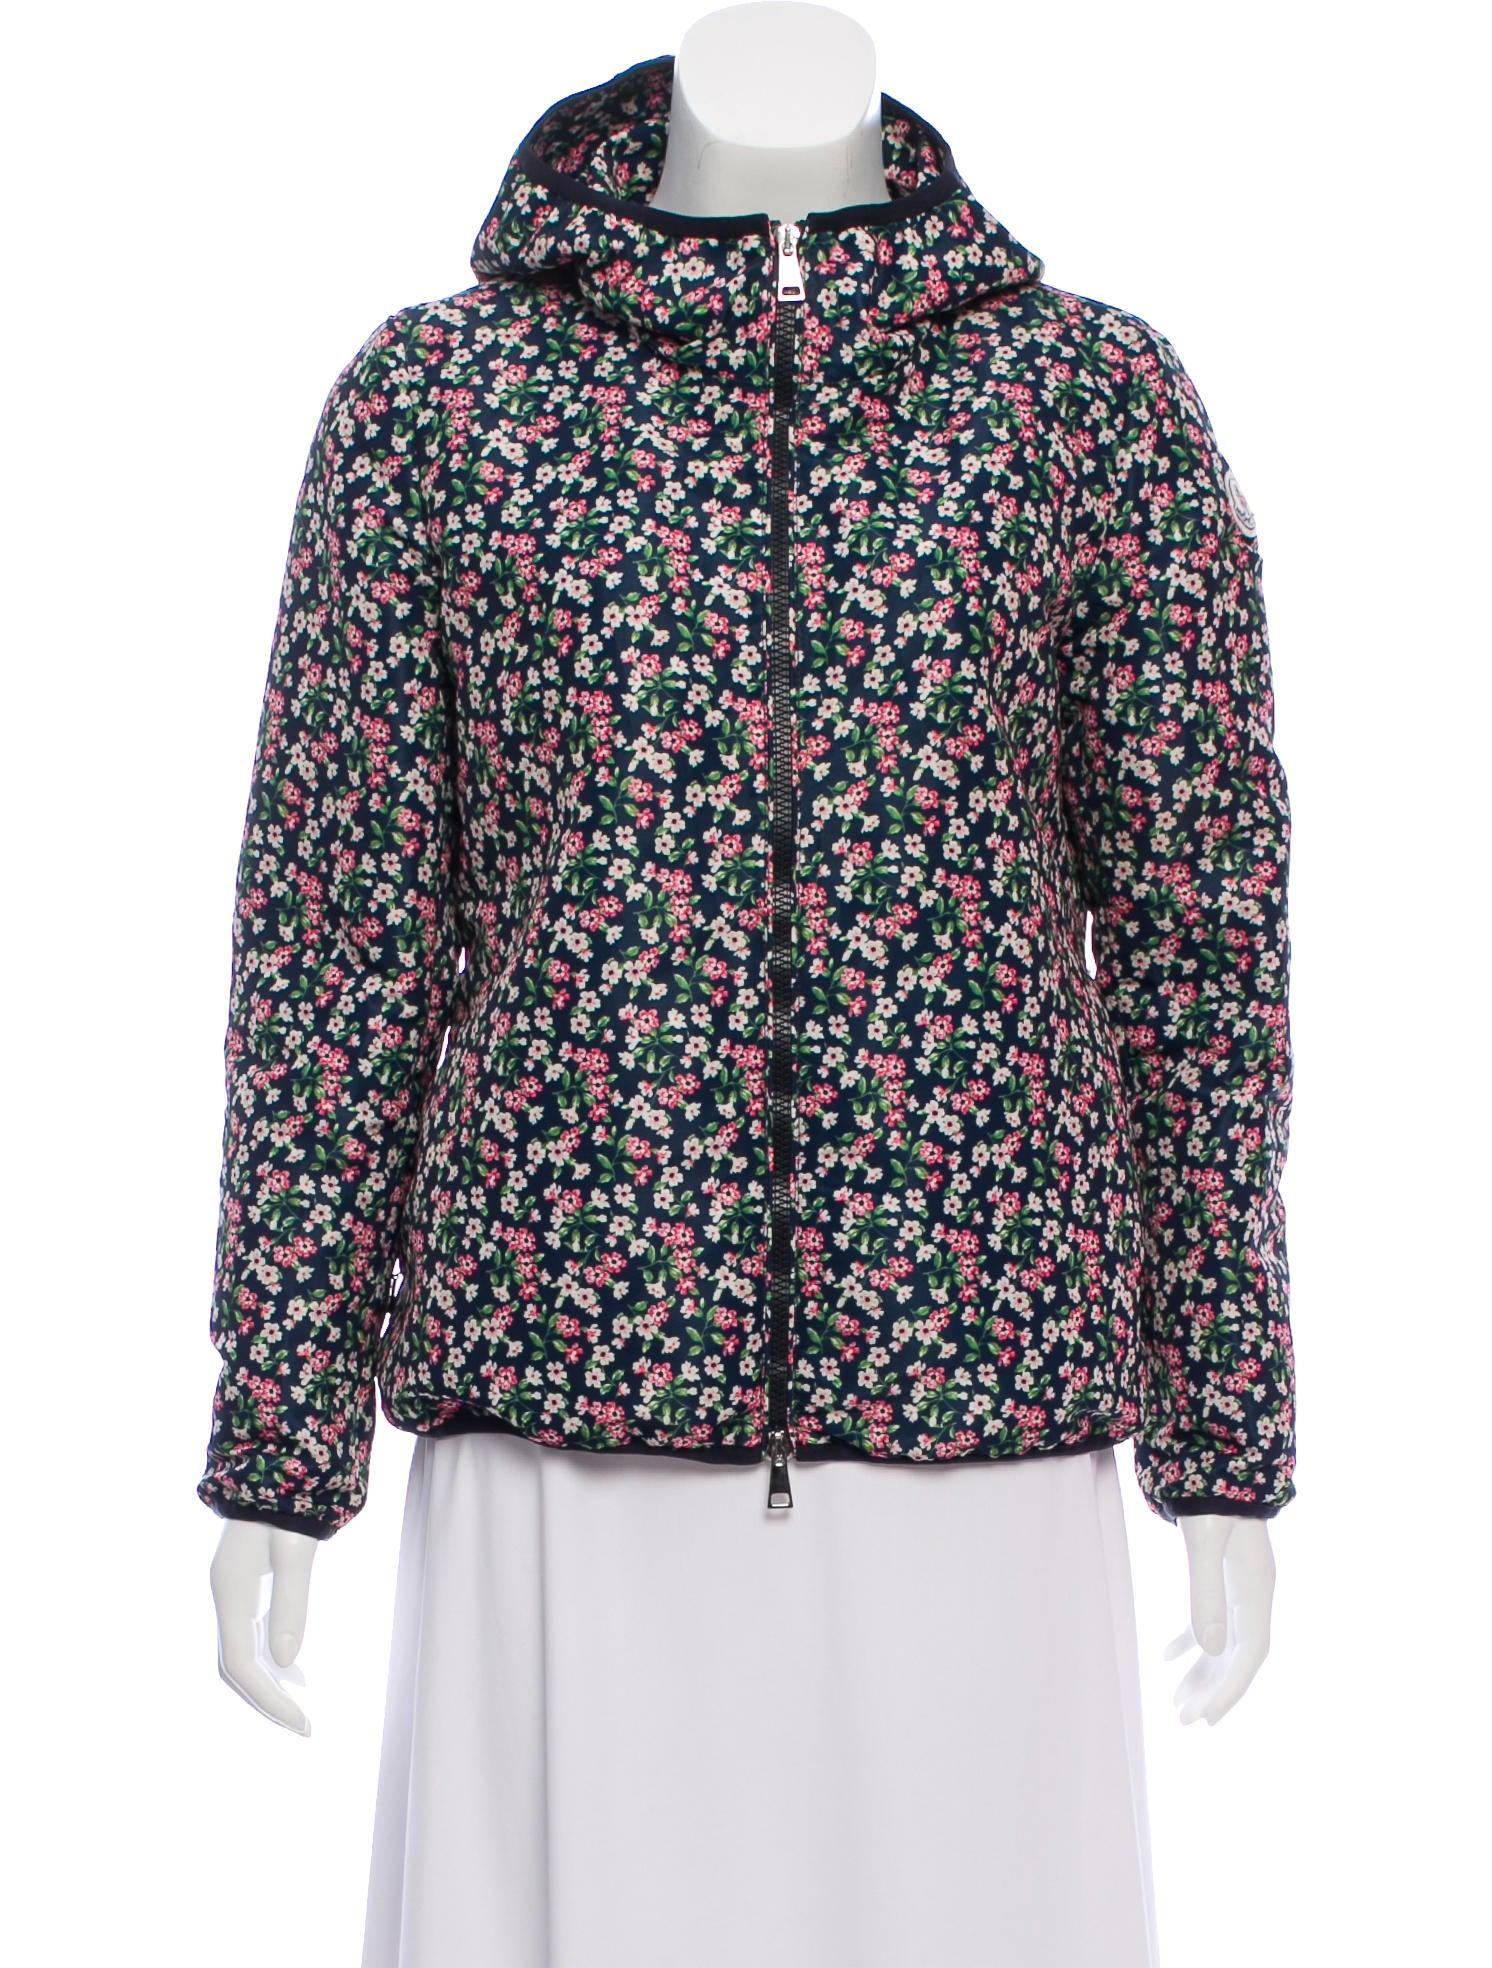 Vive Giubbotto Hooded Jacket